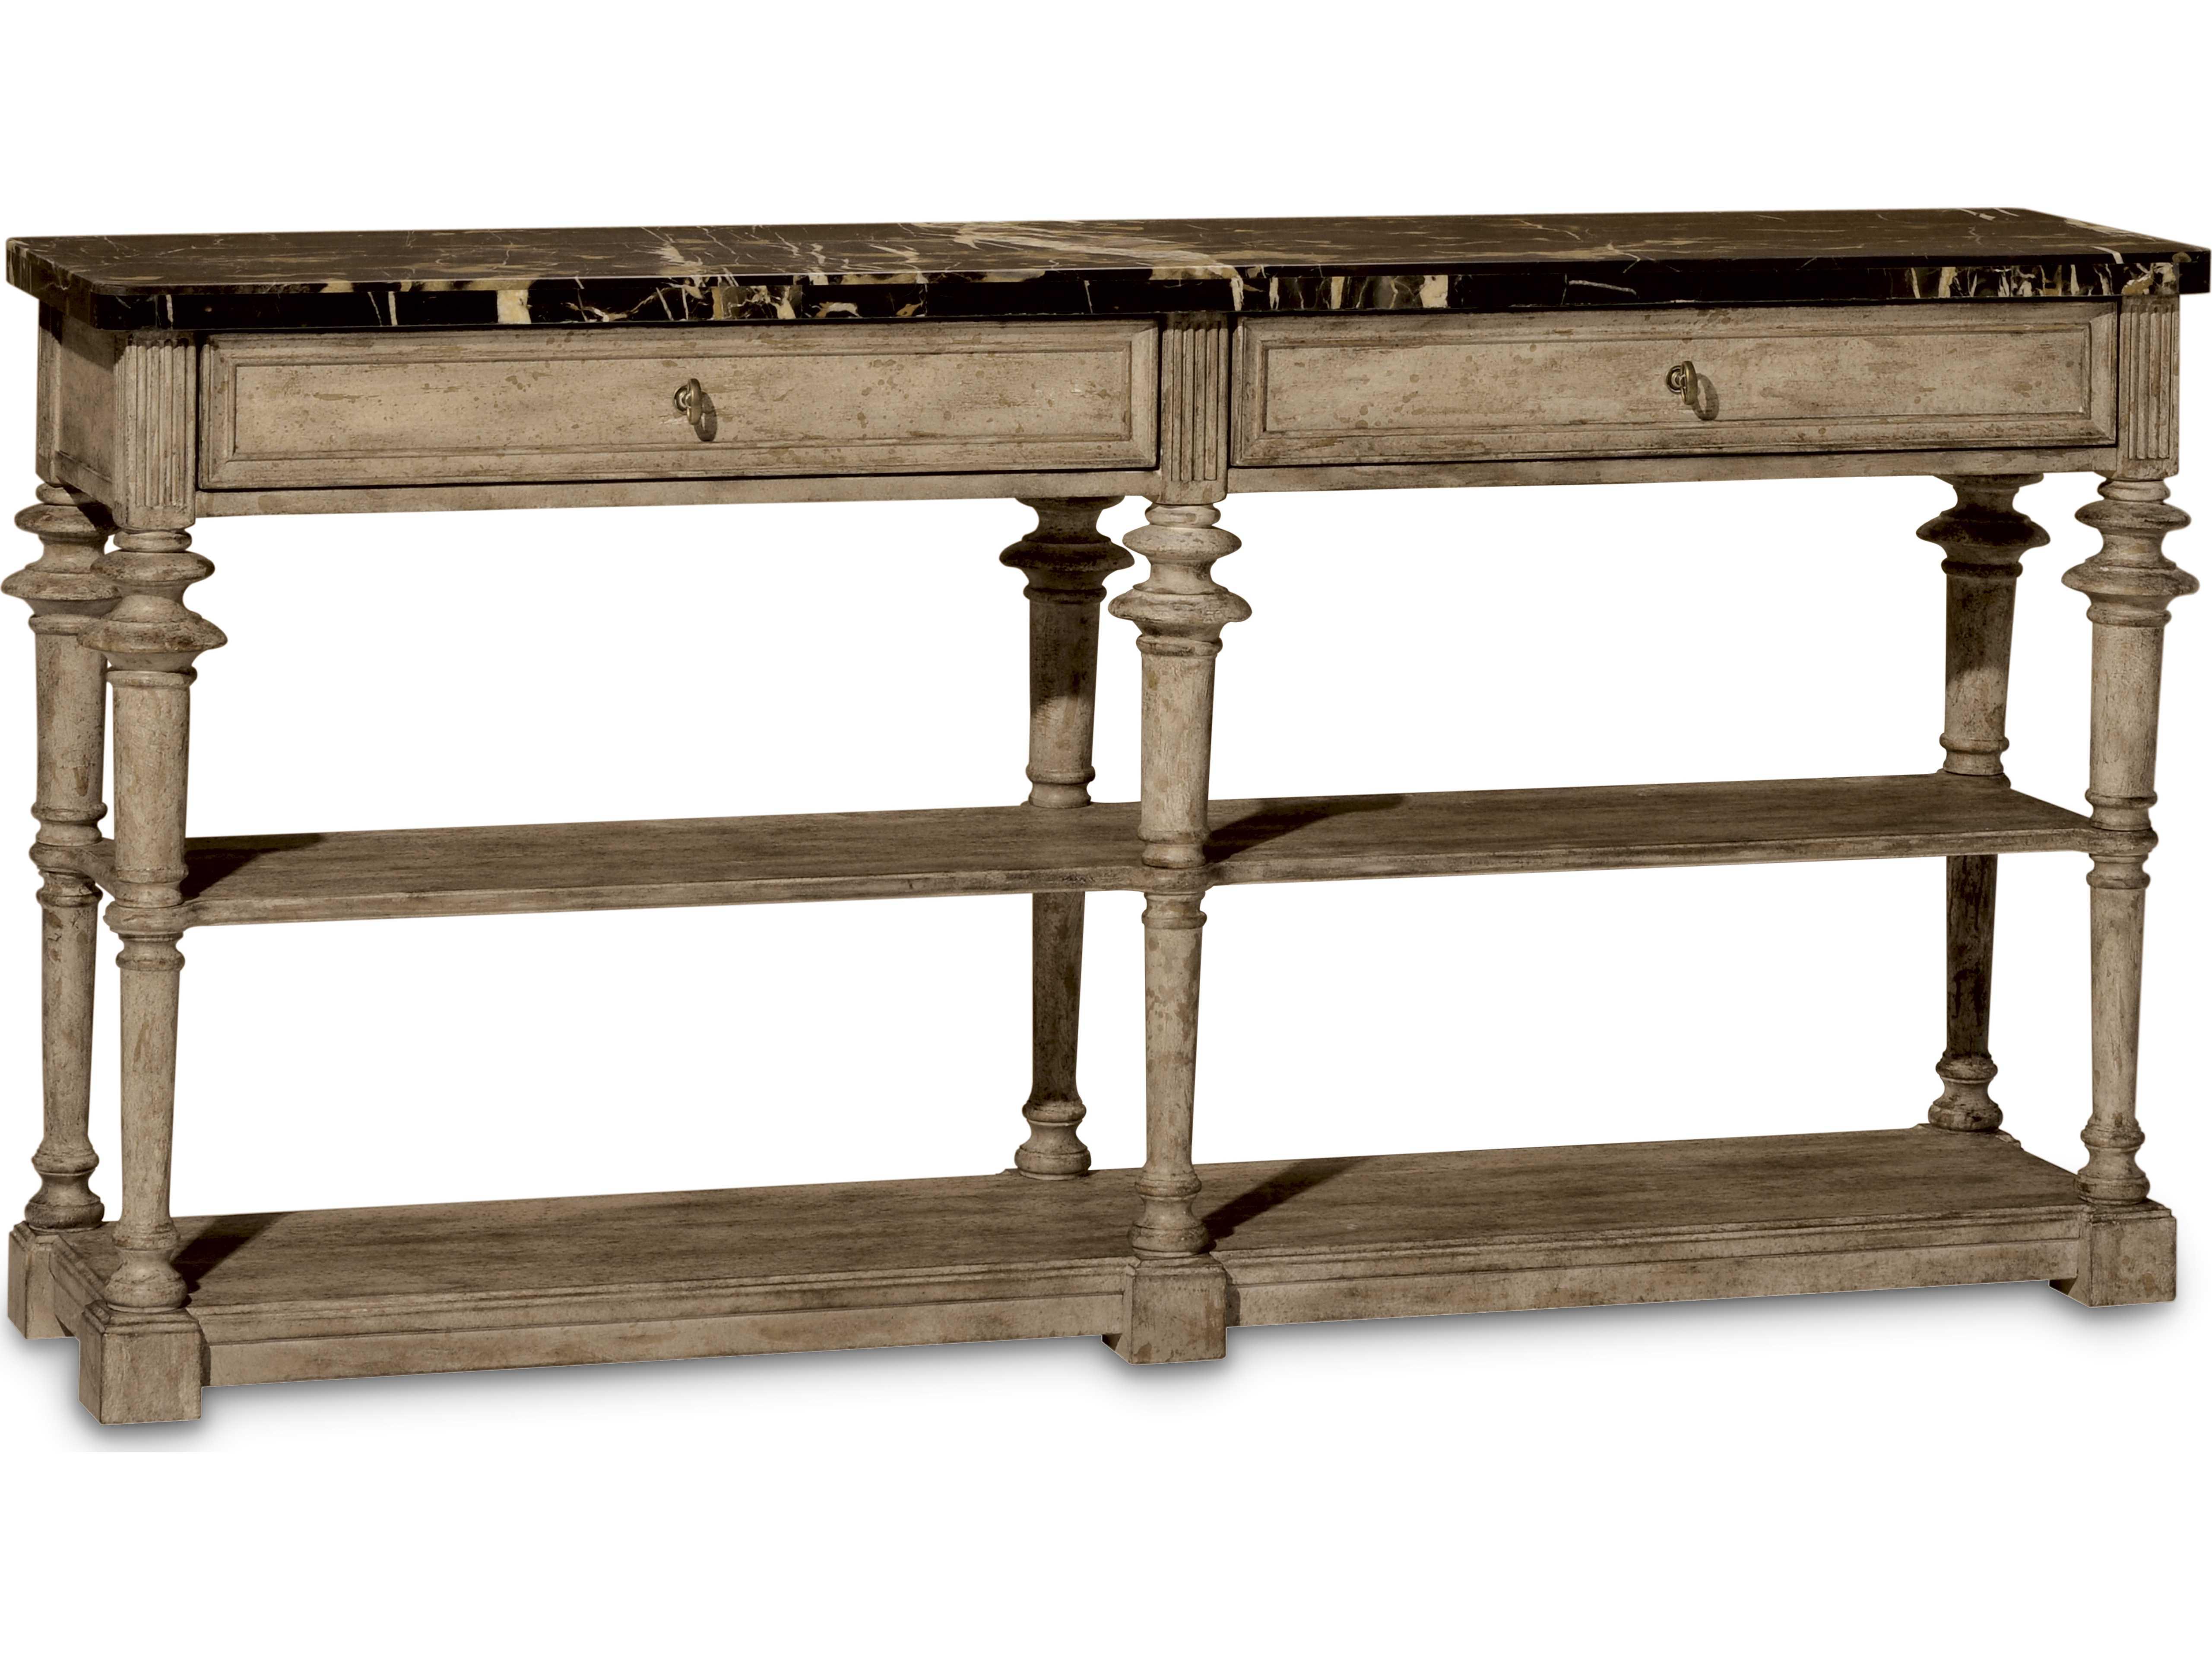 Art furniture pavilion gypsum 65 39 39 l x 15 39 39 w rectangular for 65 sofa table